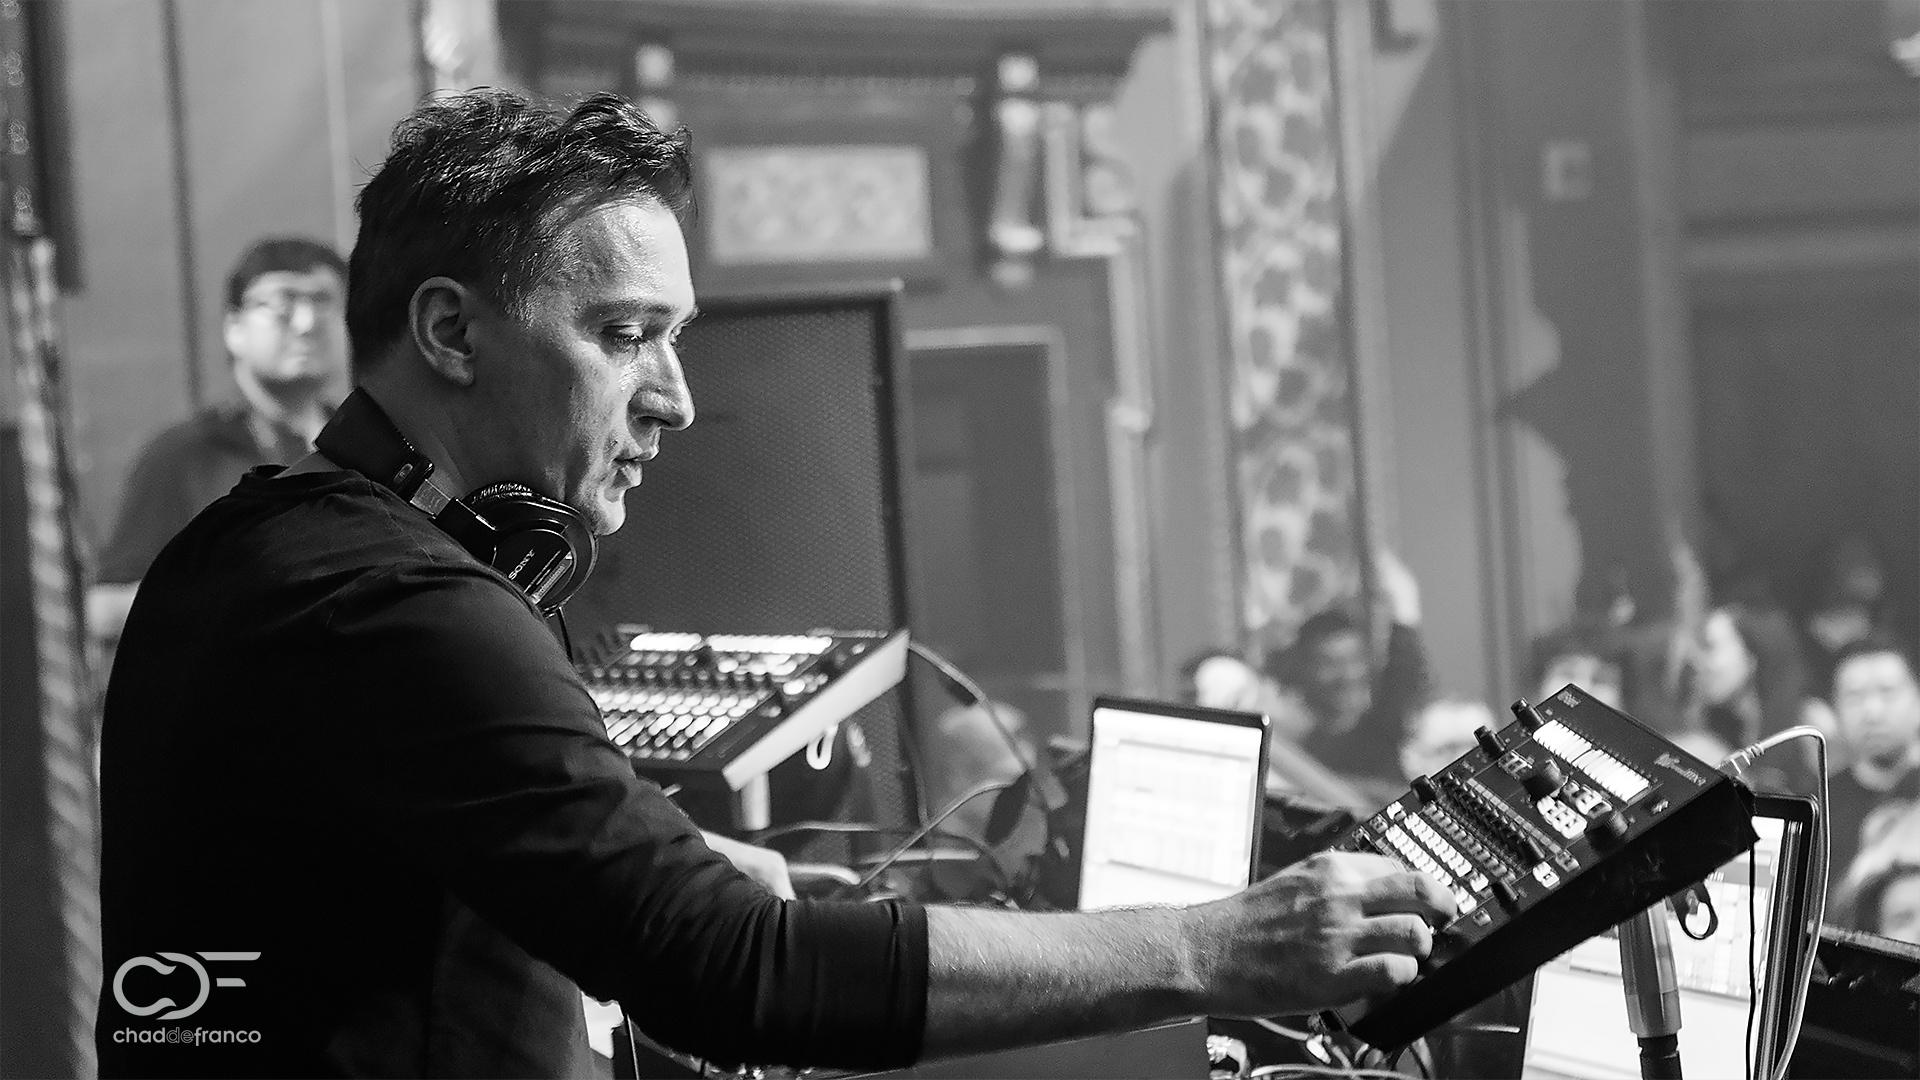 Paul van Dyk mixing live at Opera Nightclub